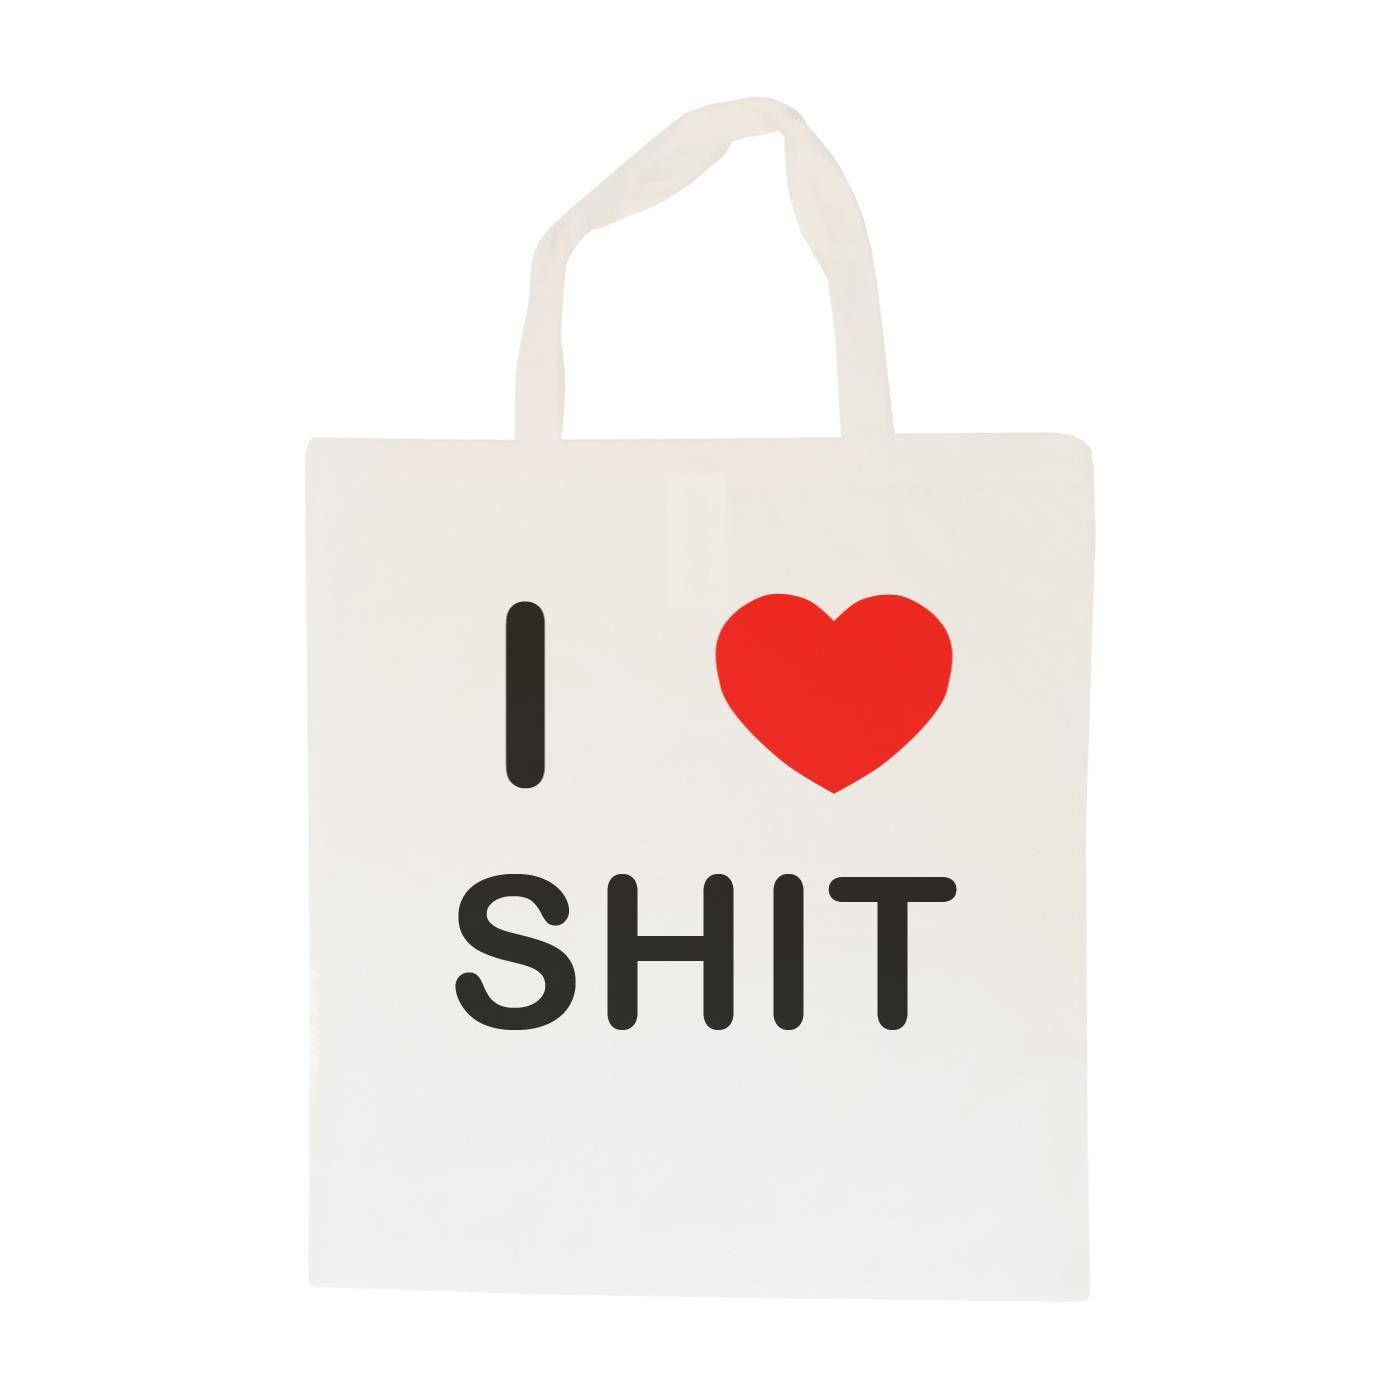 I Love Sh*t - Cotton Bag | Size choice Tote, Shopper or Sling